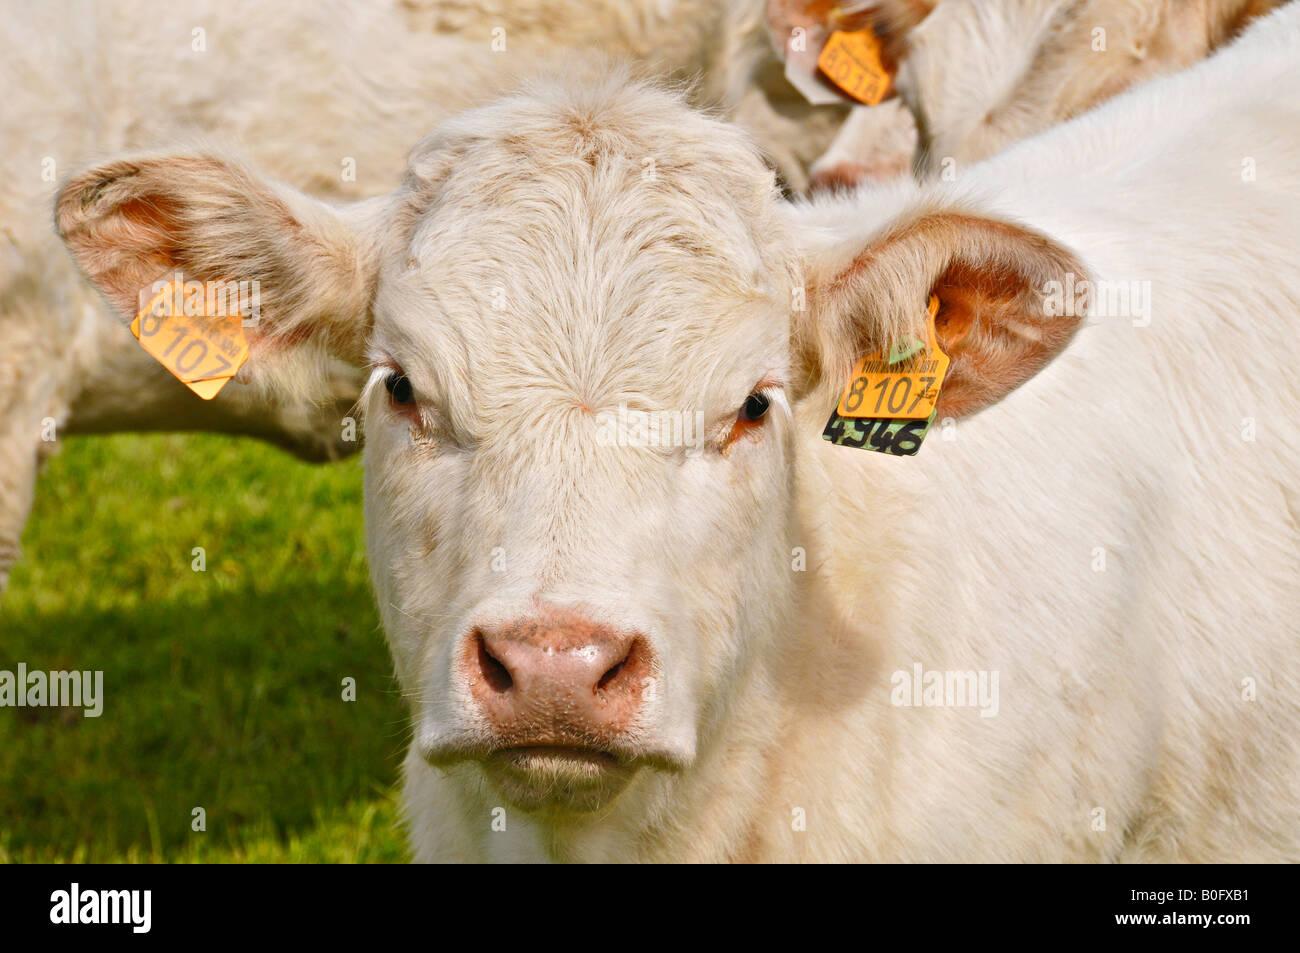 Portrait of a Charolais calf tagged in each ear. Stock Photo